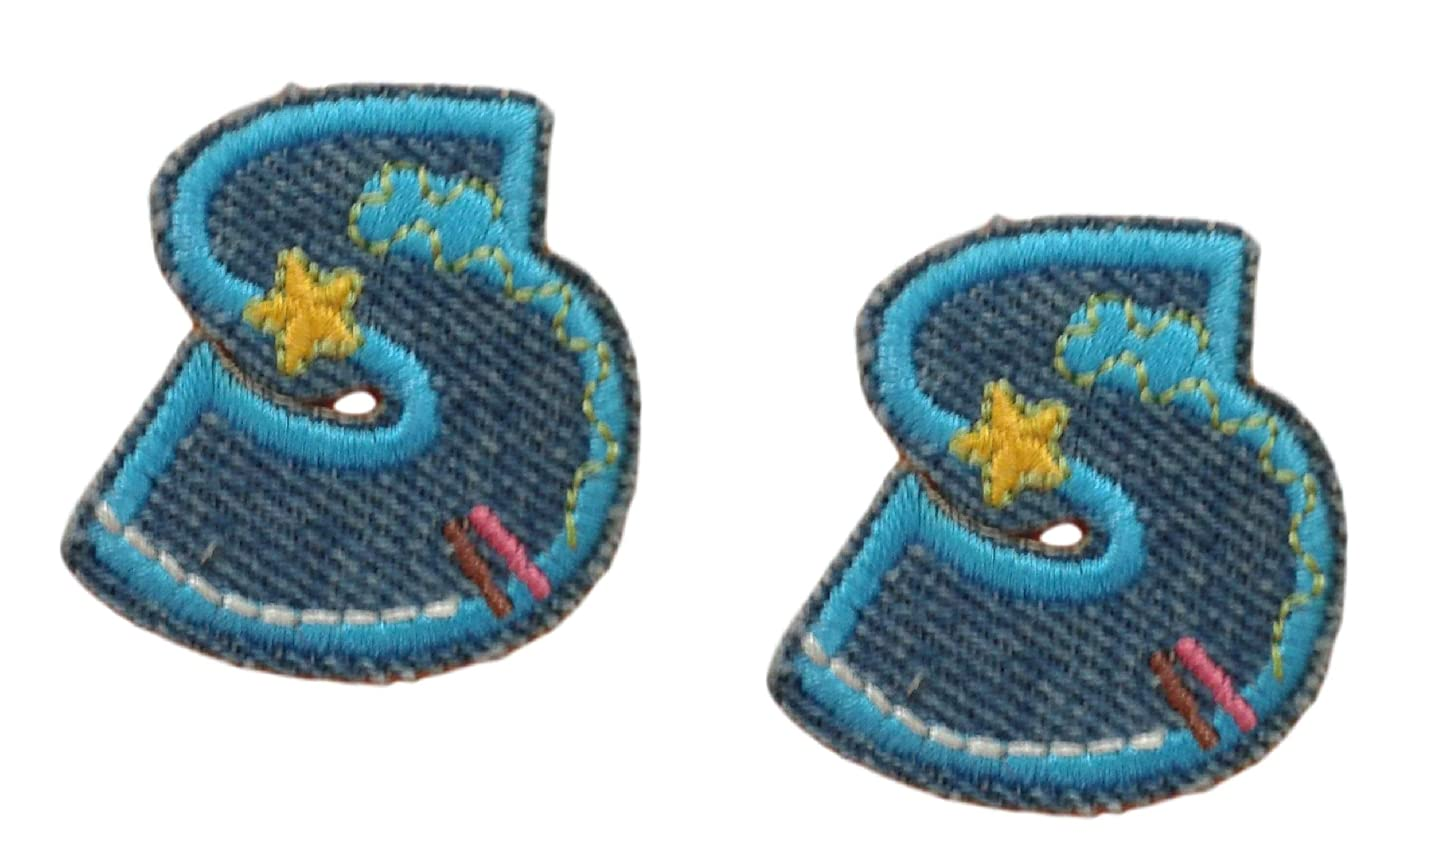 (2) Small Denim Letter S Iron On Patch Applique Motif Alphabet Symbol Scrapbooking Decal 1.4 x 1.4 inches (3.5 x 3.5 cm)